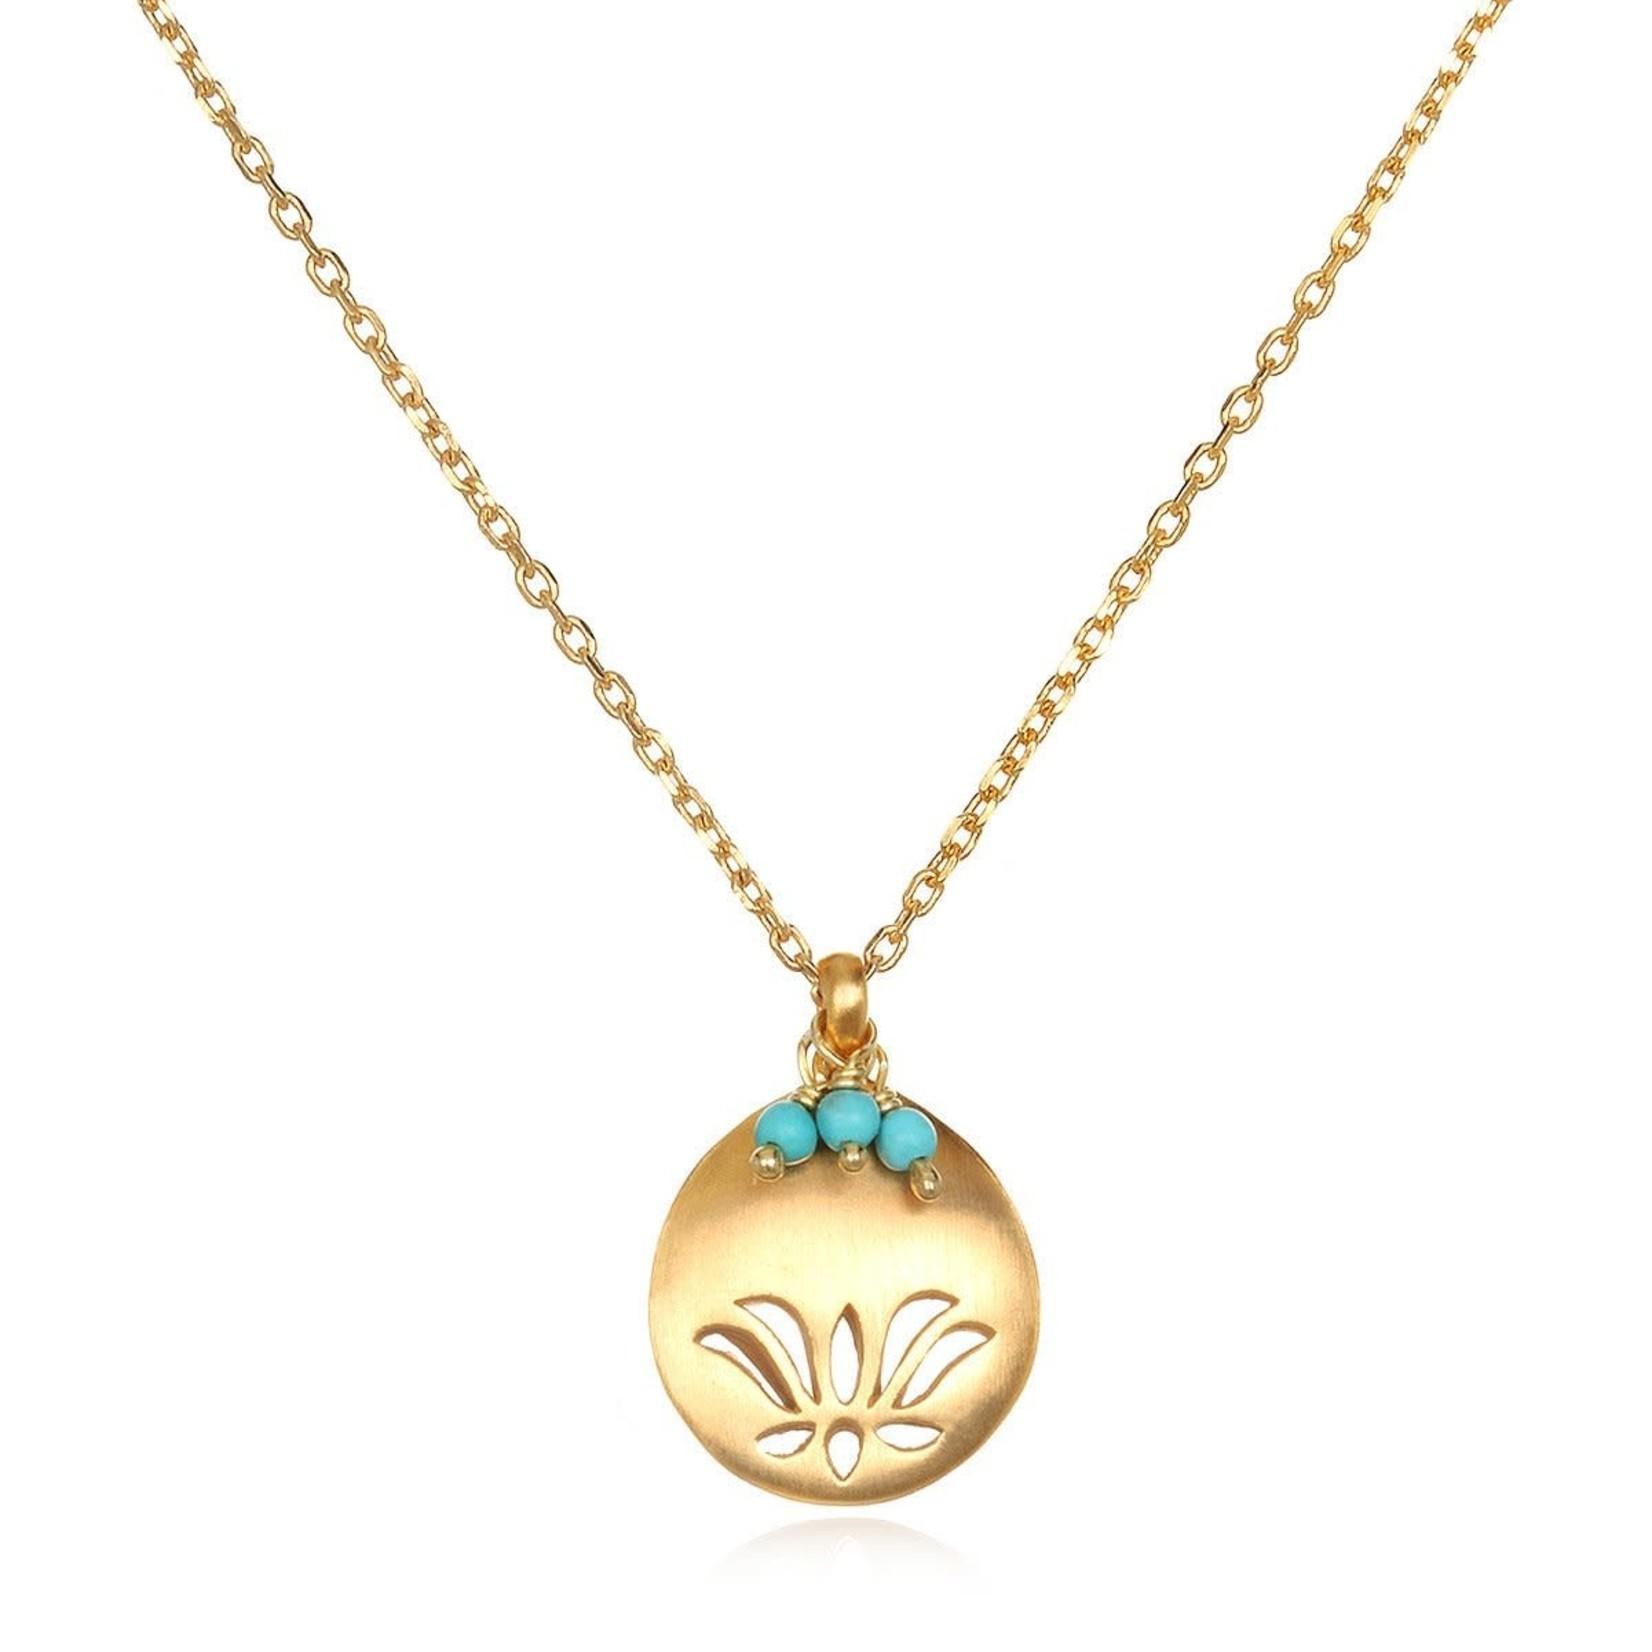 Satya Satya Lotus Birthstone Necklace - December - Turquoise